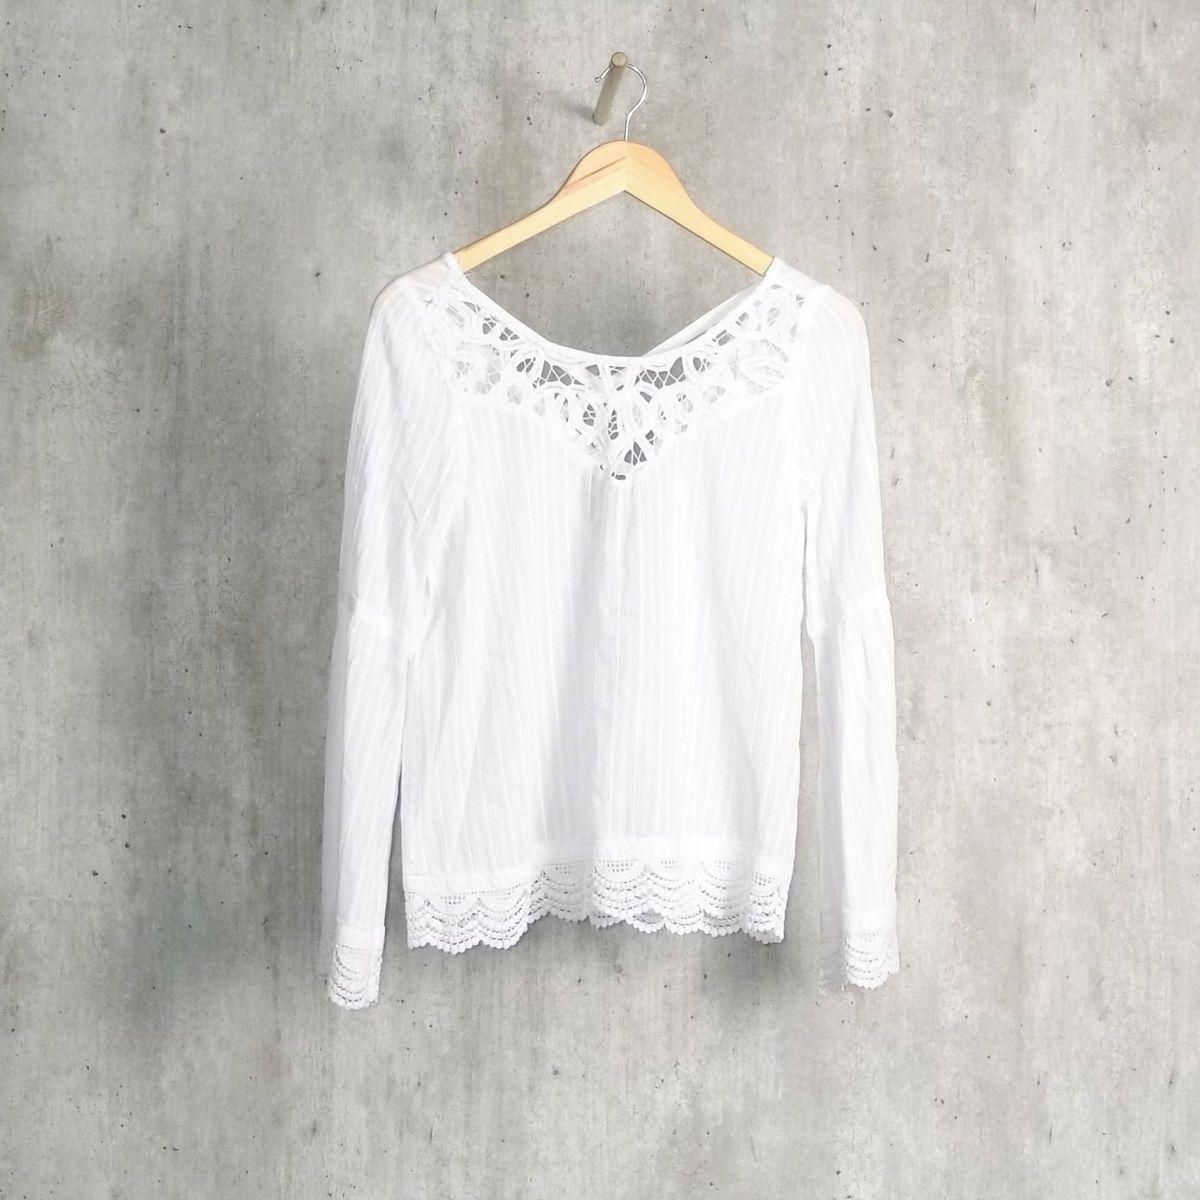 7e725bf40d blusa branca com detalhe em renda - blusas guess.  Czm6ly9wag90b3muzw5qb2vplmnvbs5ici9wcm9kdwn0cy83mzk0mtqxlznknze0nzfjzme0nwmwngiznzi0yjbjmdi1zdu0njc4lmpwzw